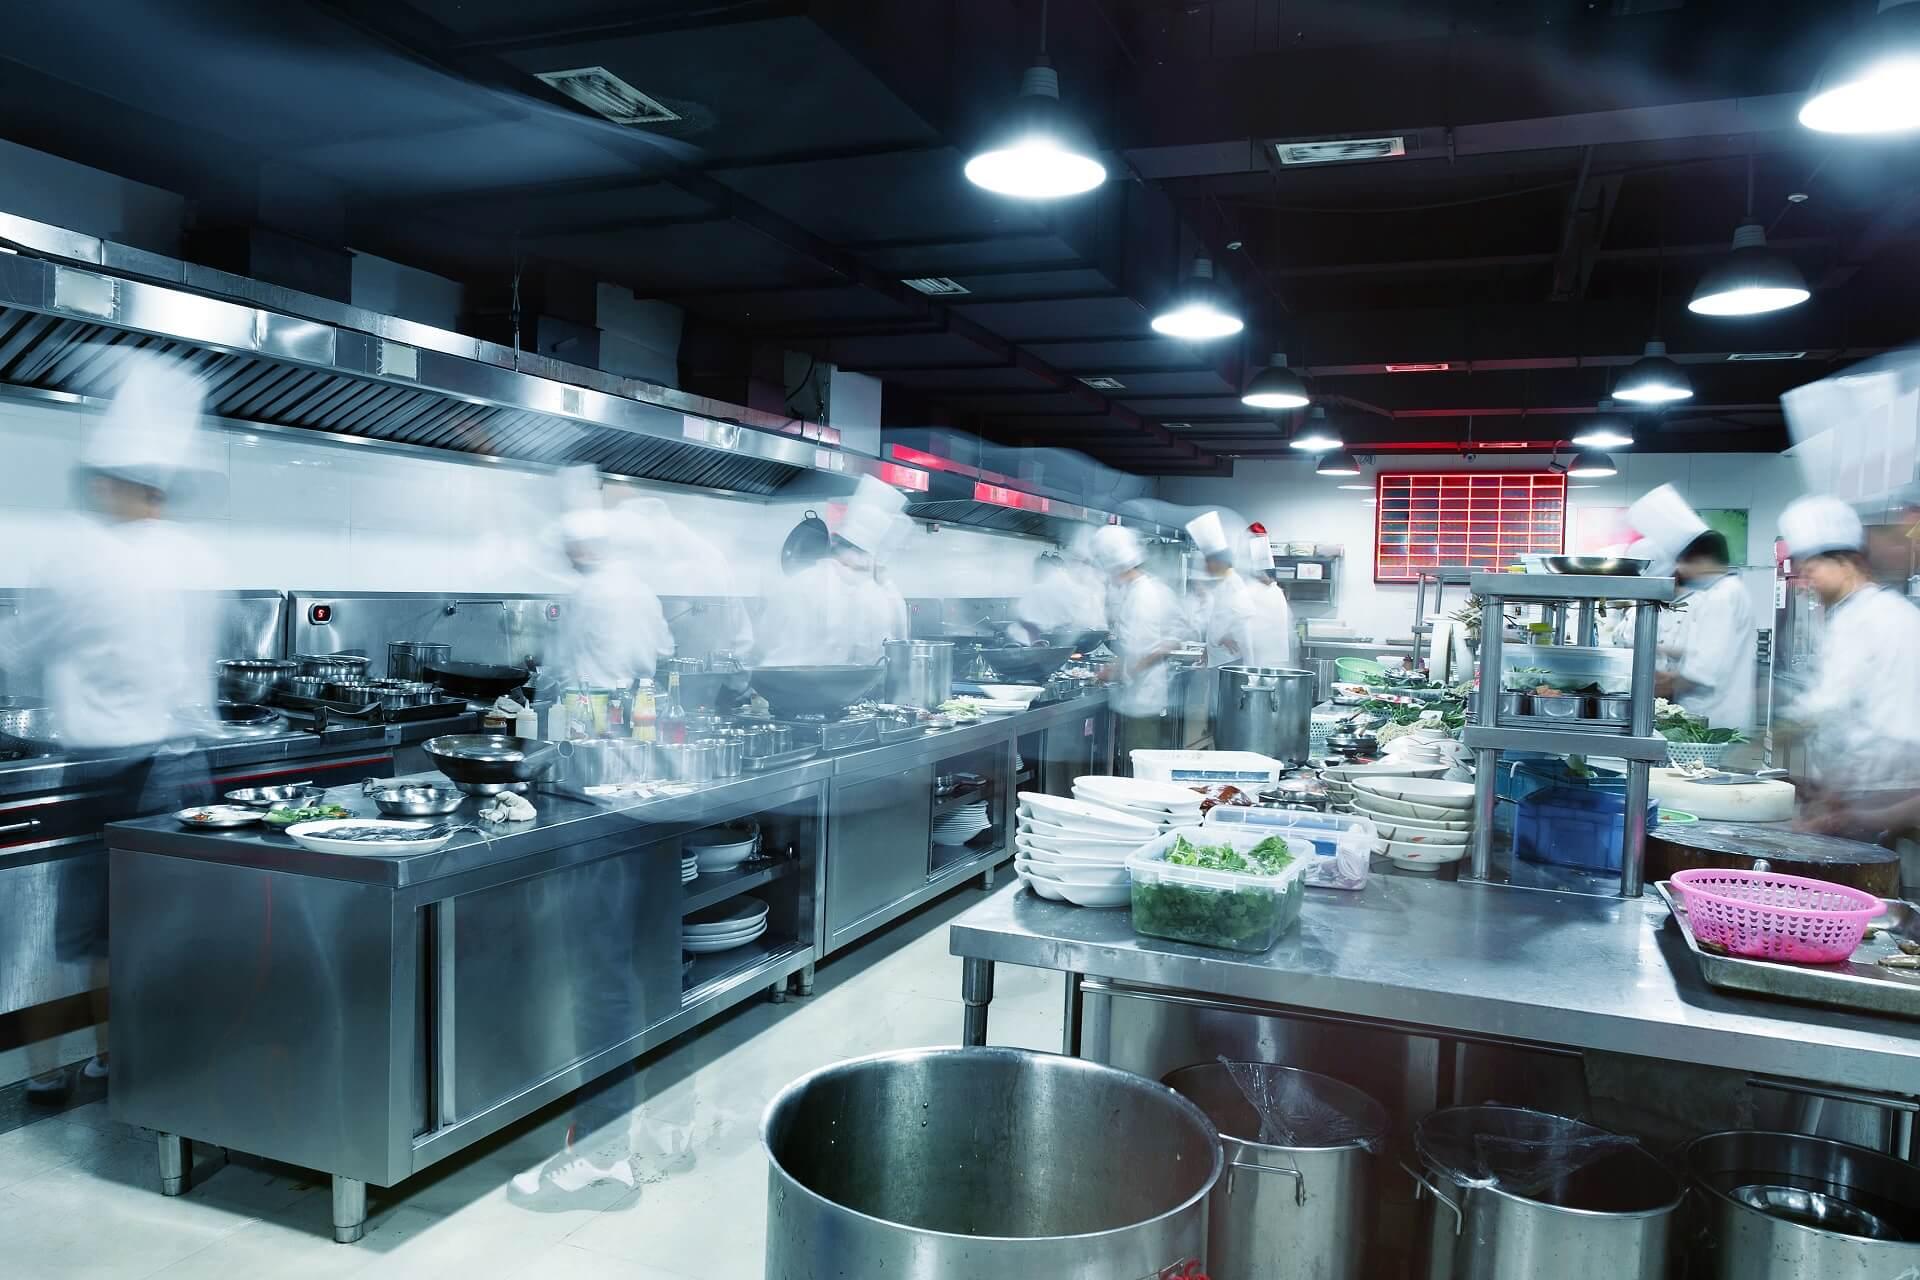 Food service association